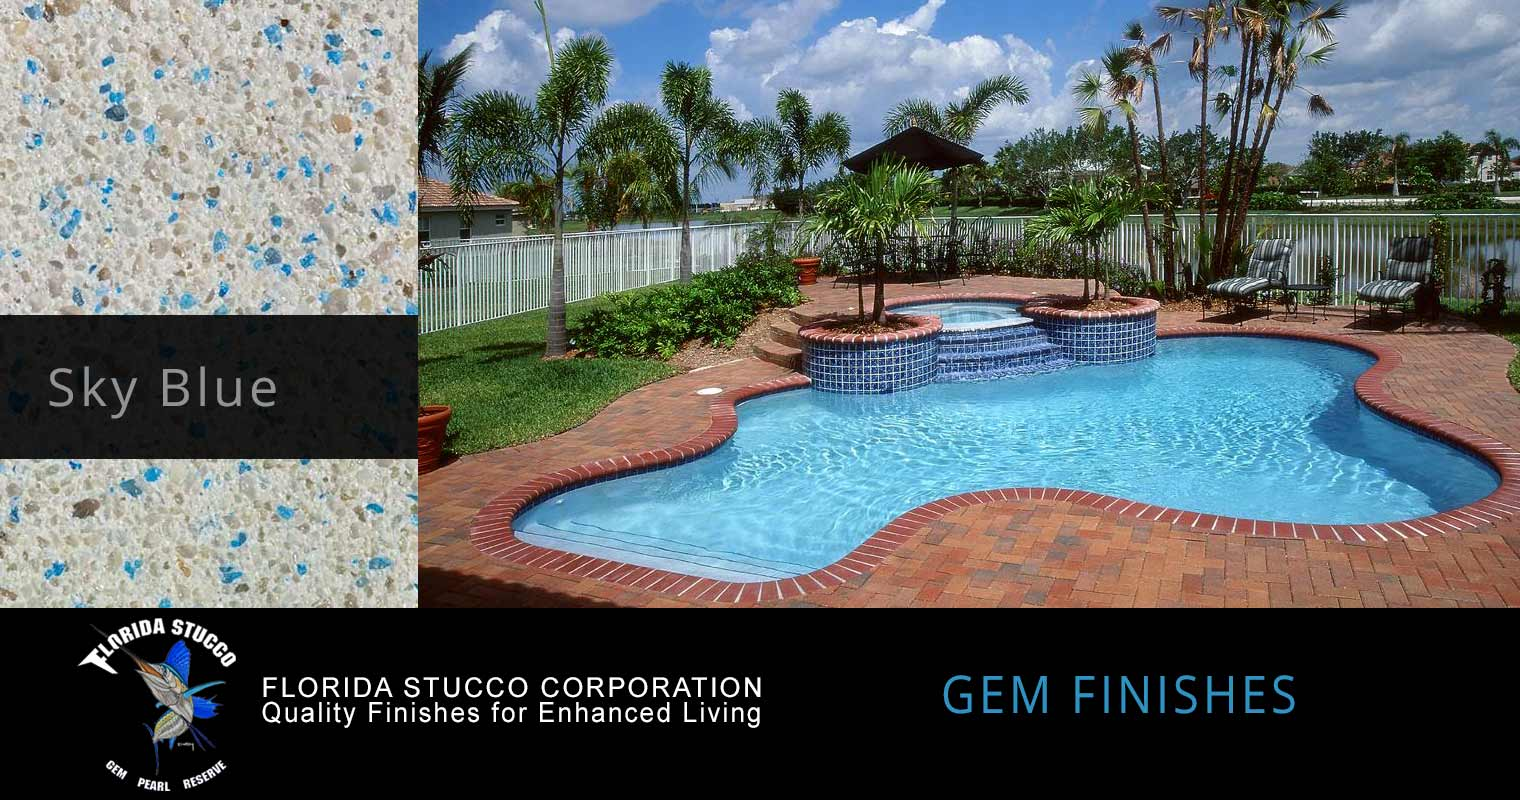 Florida Stucco - Sky Blue Plastering Finish Pool Sample 2